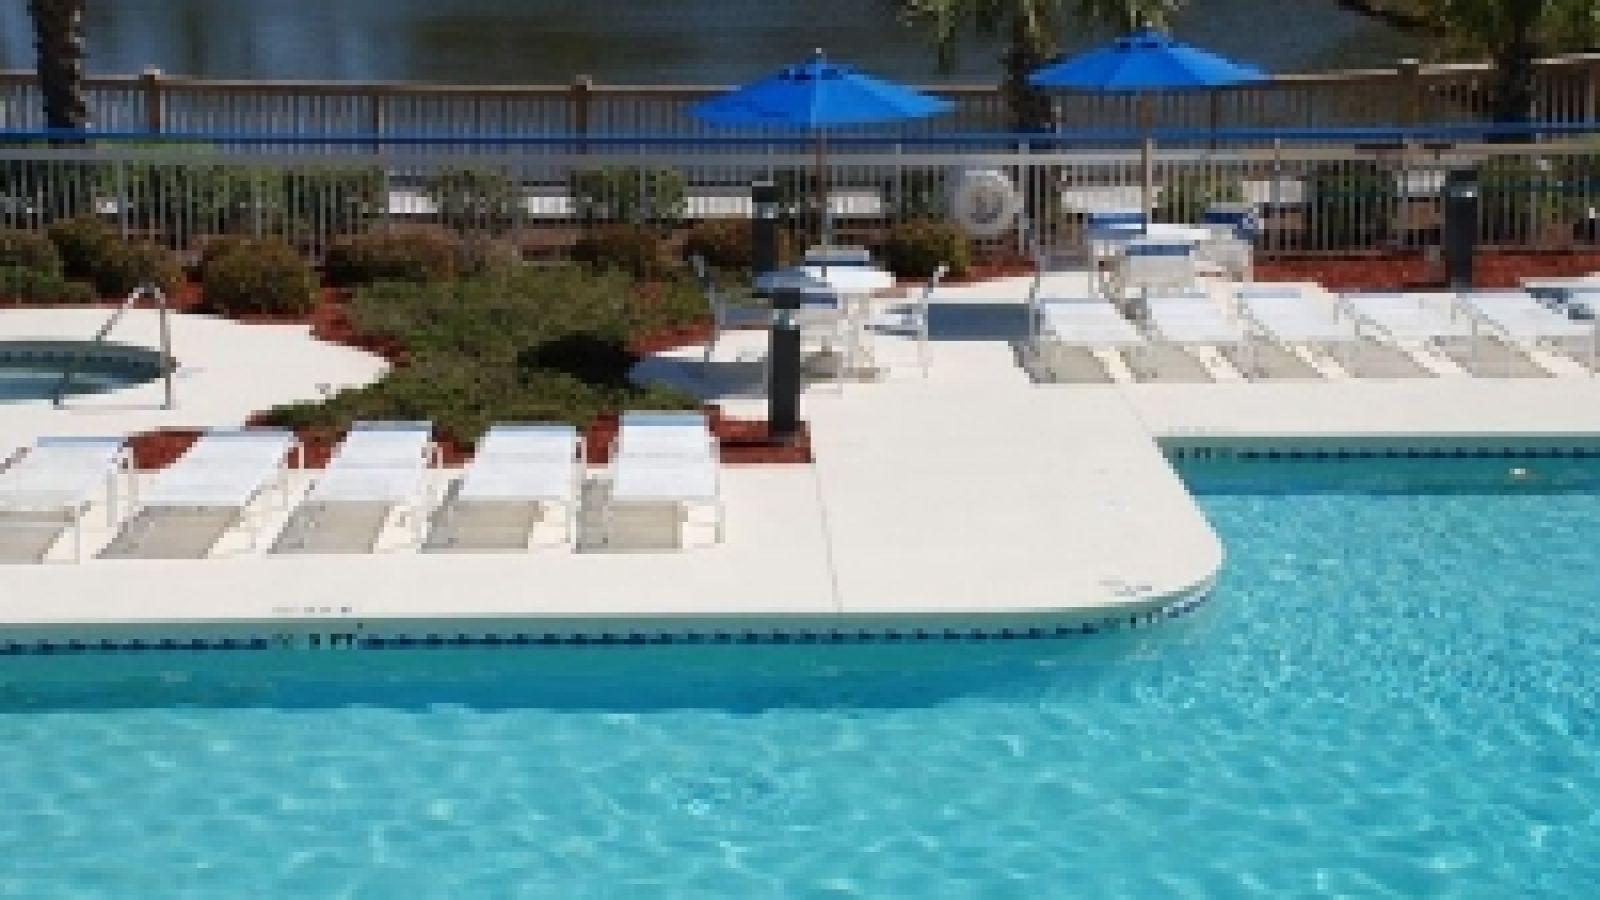 Fairfield Inn Broadway at the Beach - Myrtle Beach golf packages